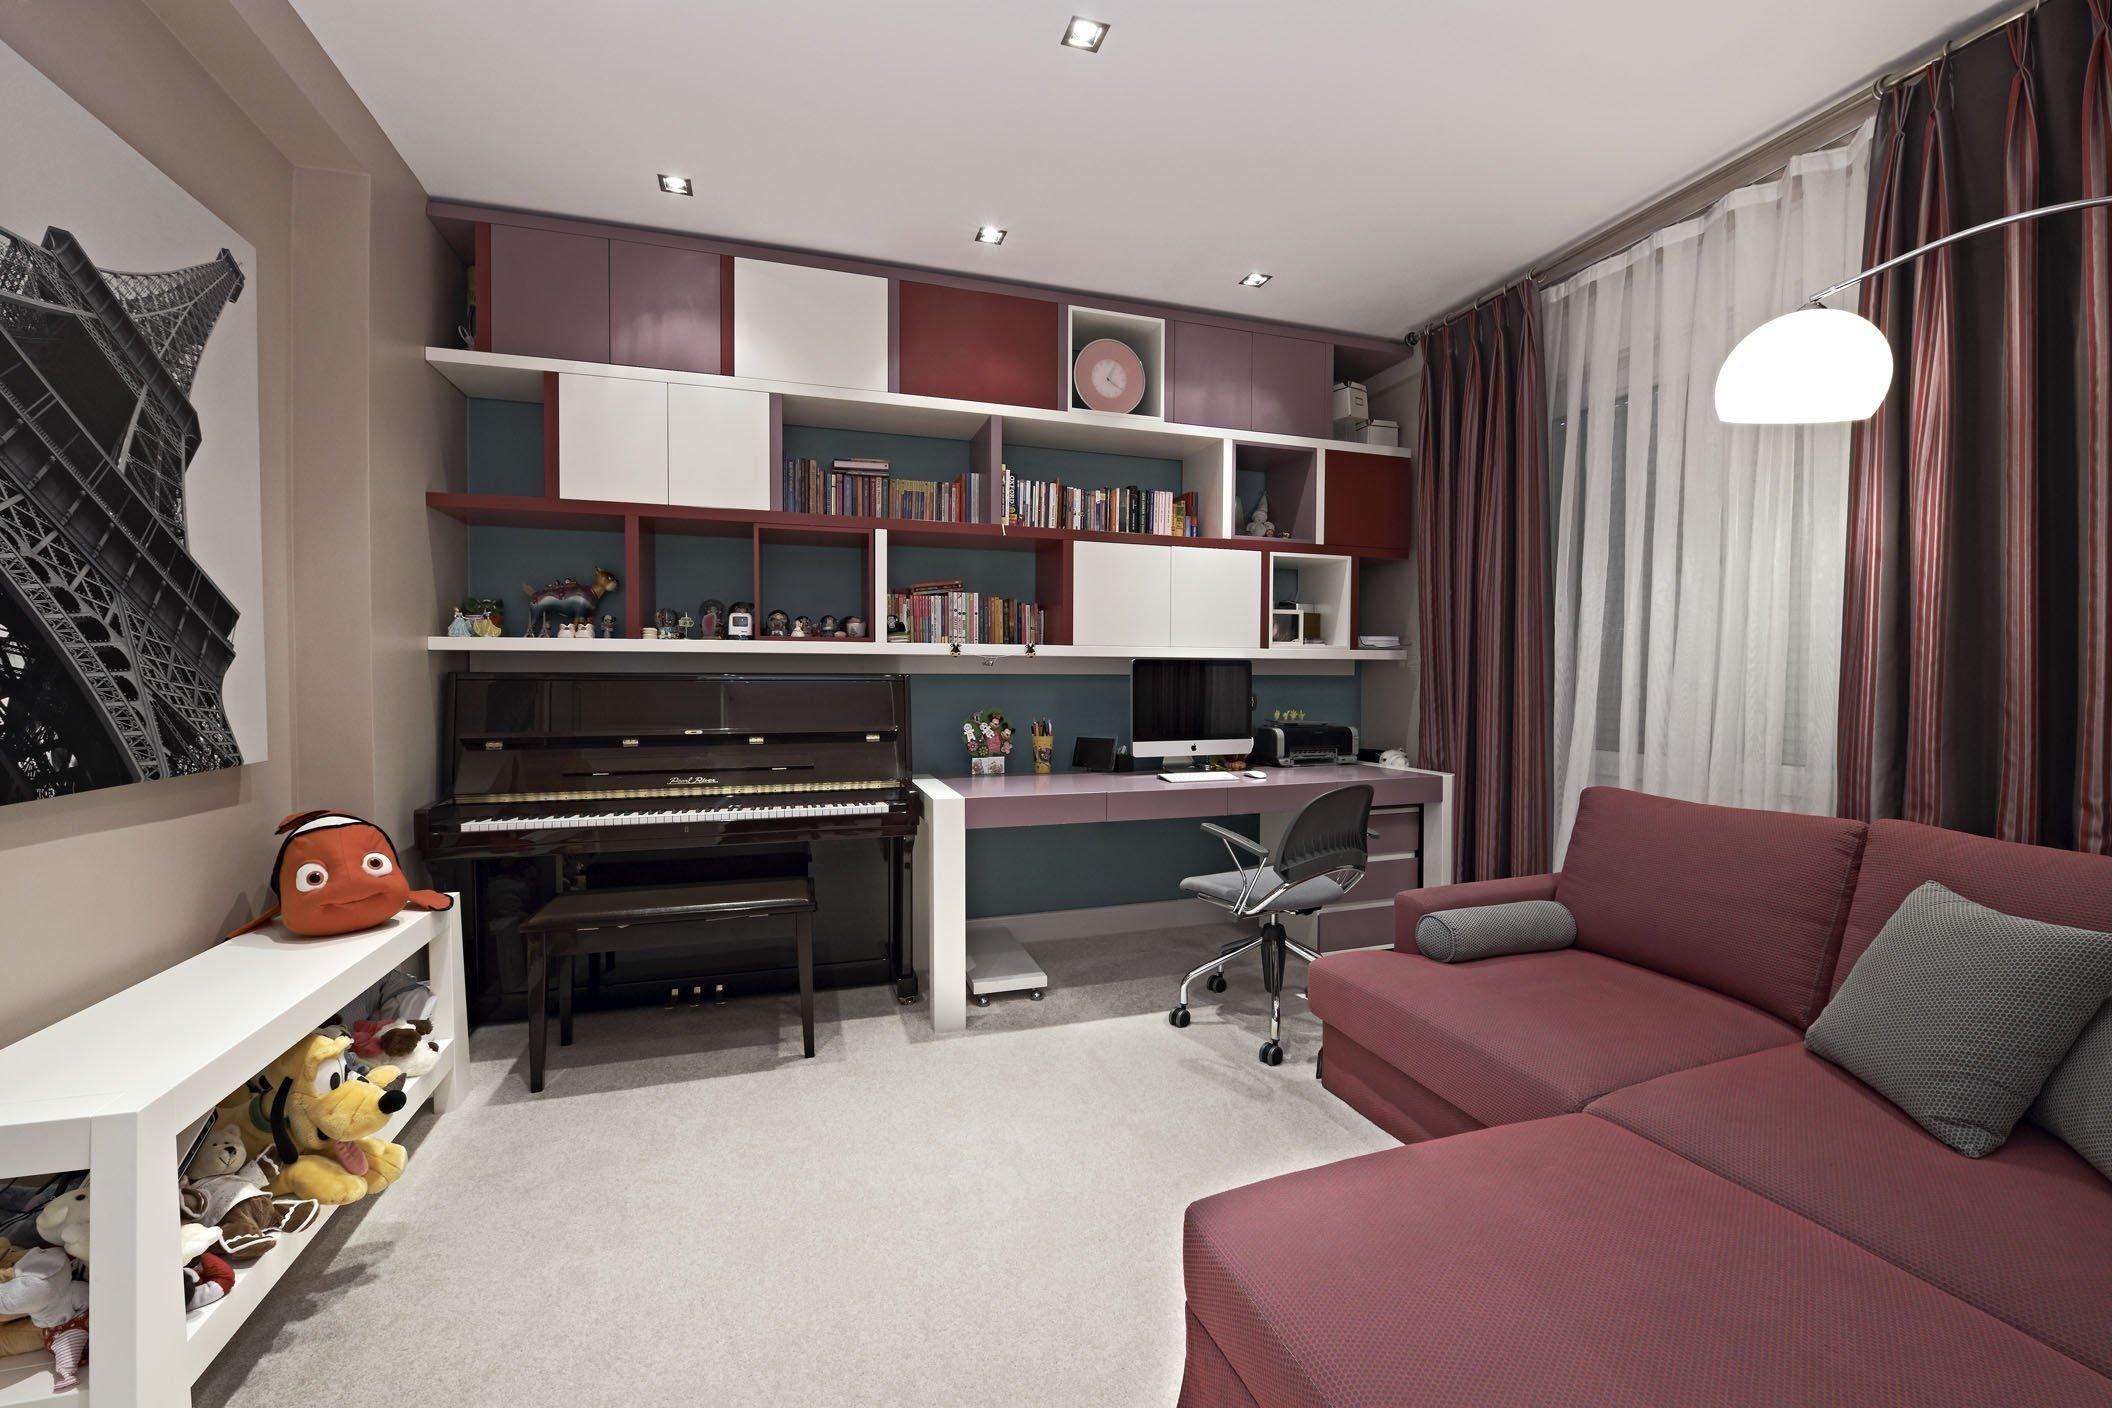 Молодежная комната с угловым диваном